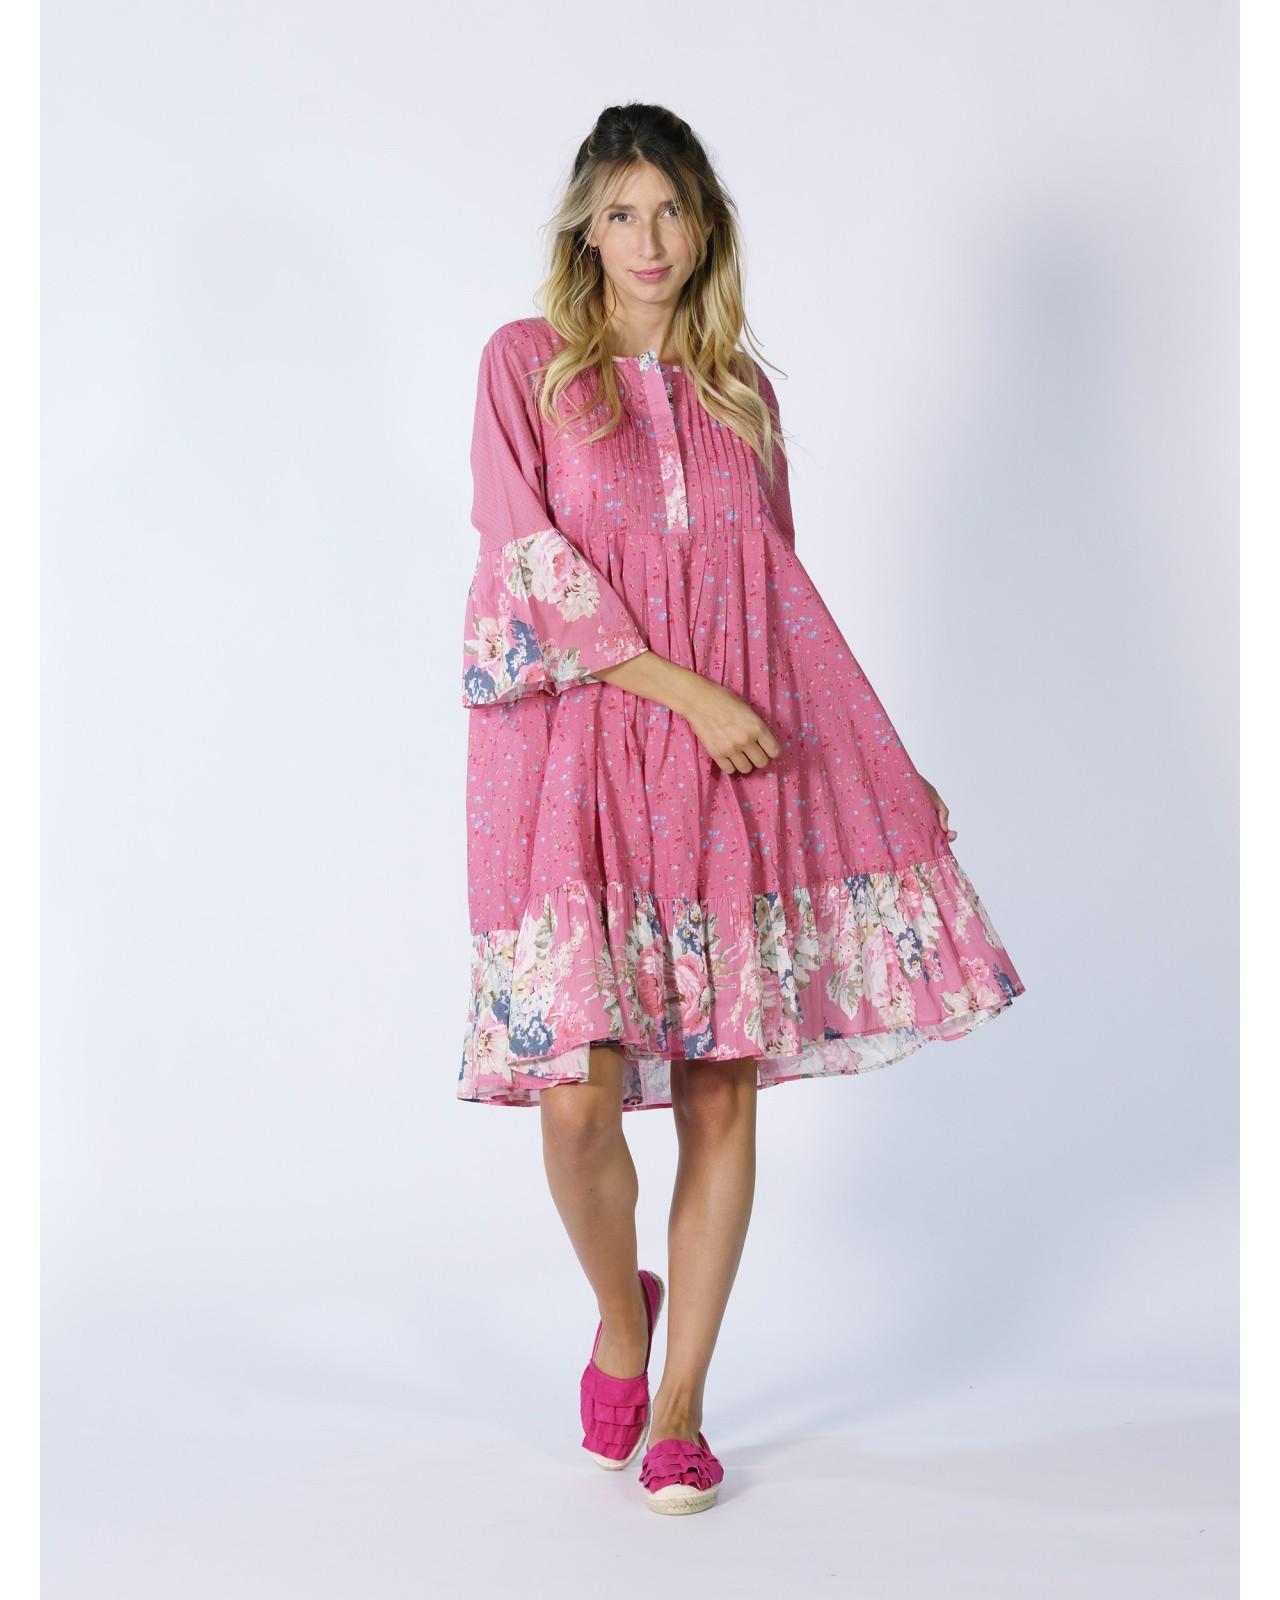 Rhum Raisin loose robe, Valensole 65